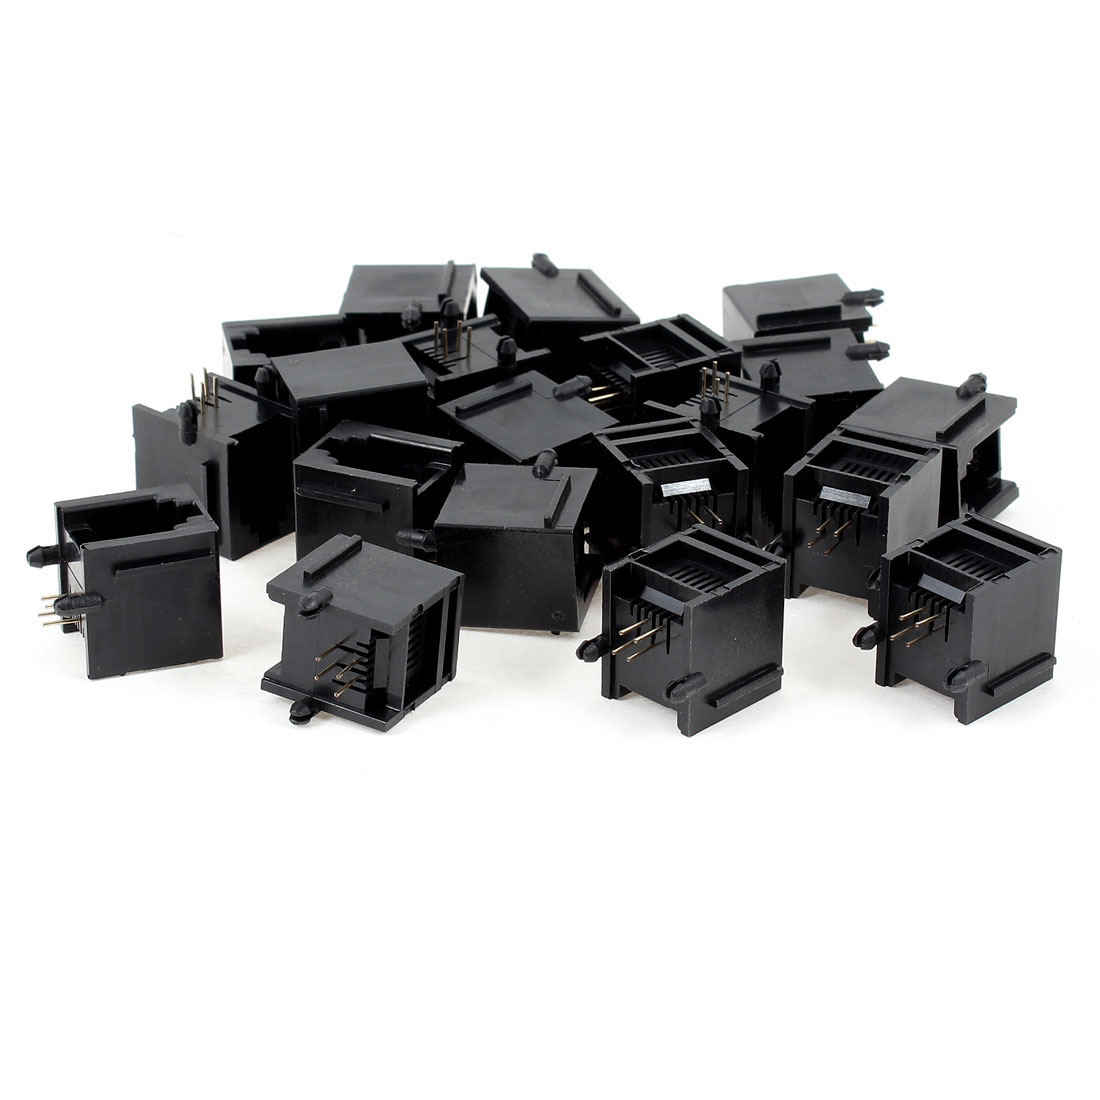 20 Pcs Black Plastic Unshielded RJ11 6P4C Network Modular PCB Connector Jacks